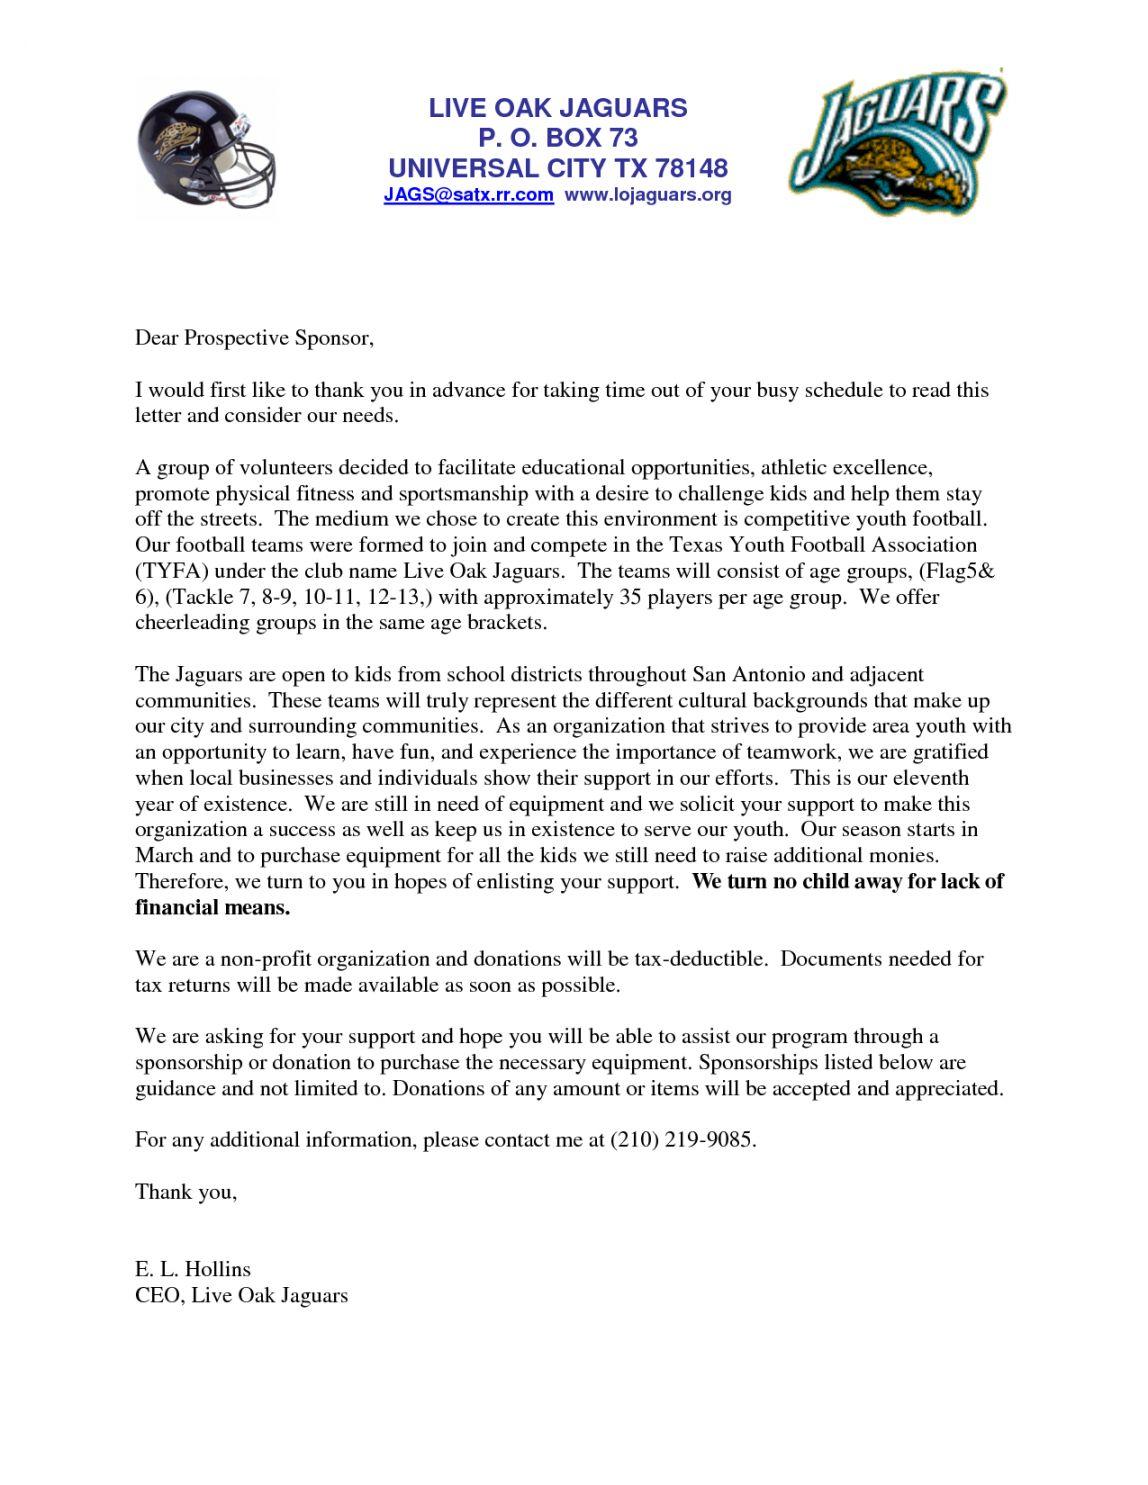 Printable Letters For Sports Teams Youth Sponsorship Letter Team Basketball Fundraising Lette Sponsorship Letter Donation Request Letters Fundraising Letter